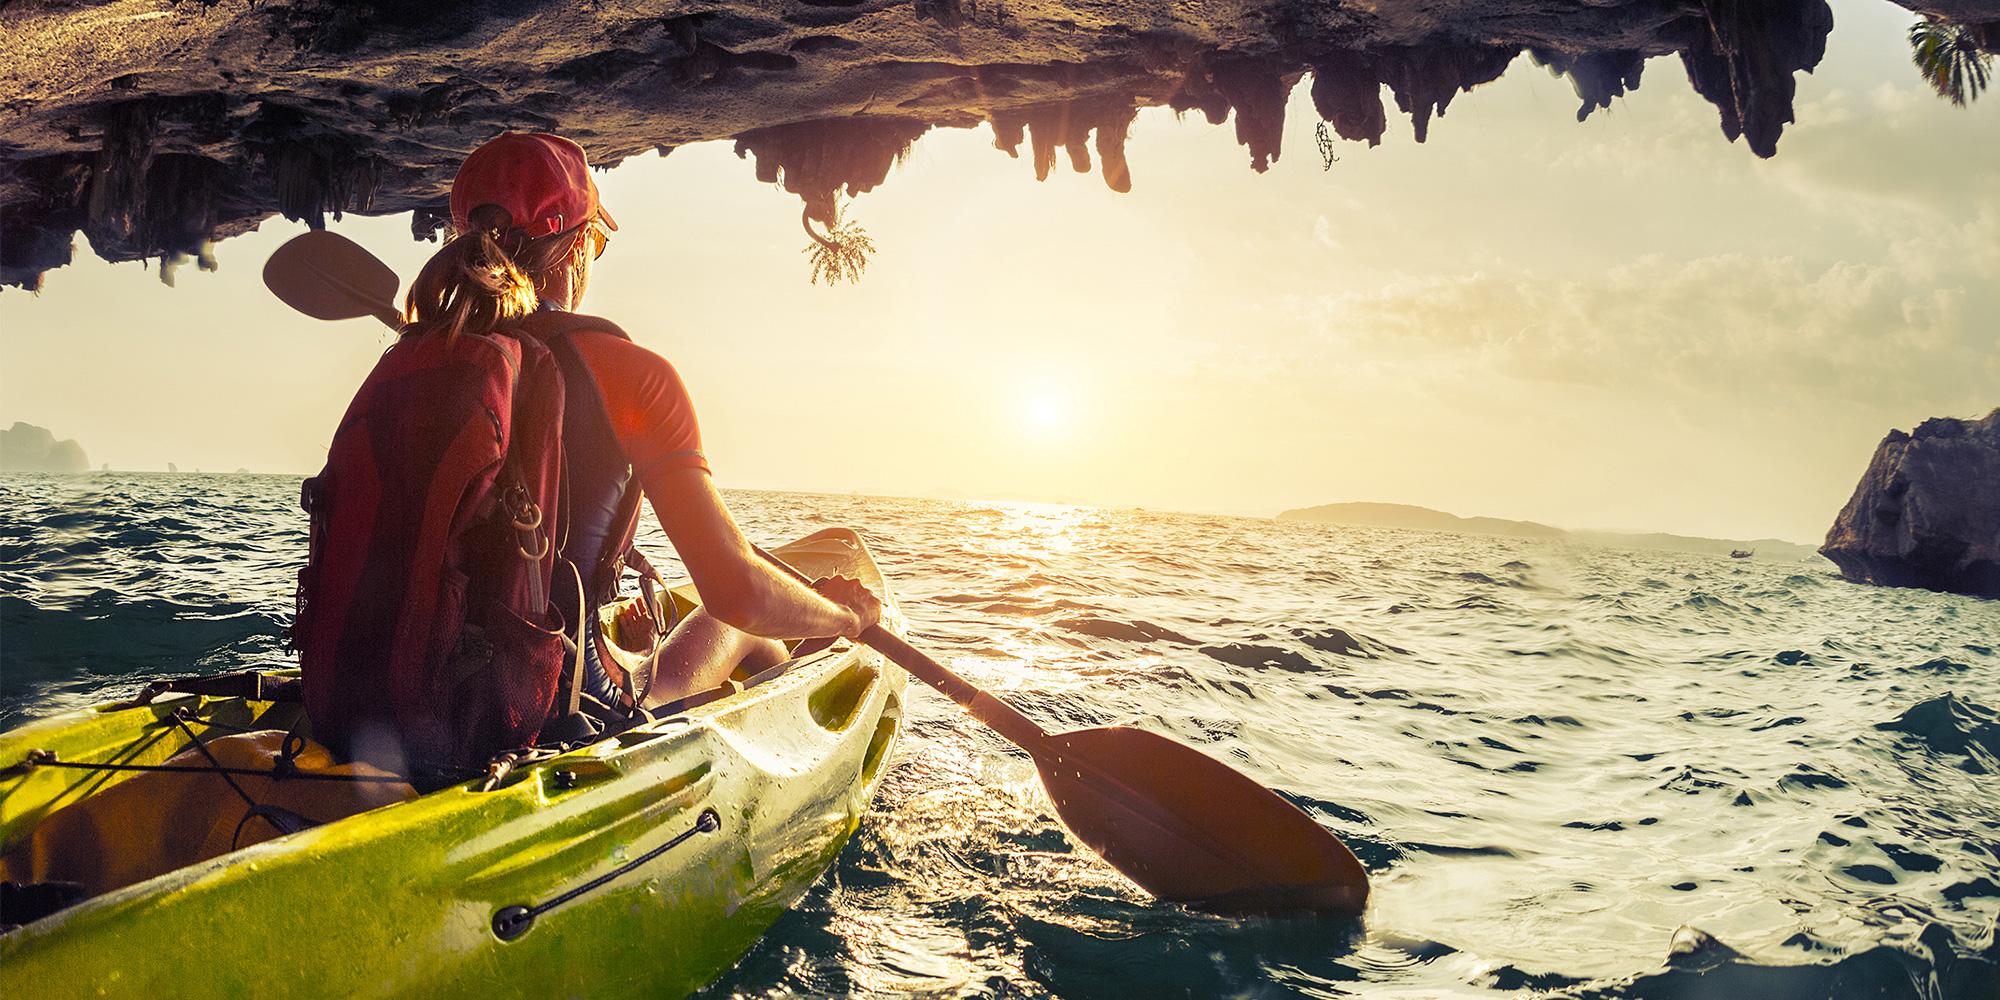 Leveraging Tourism for Conservation